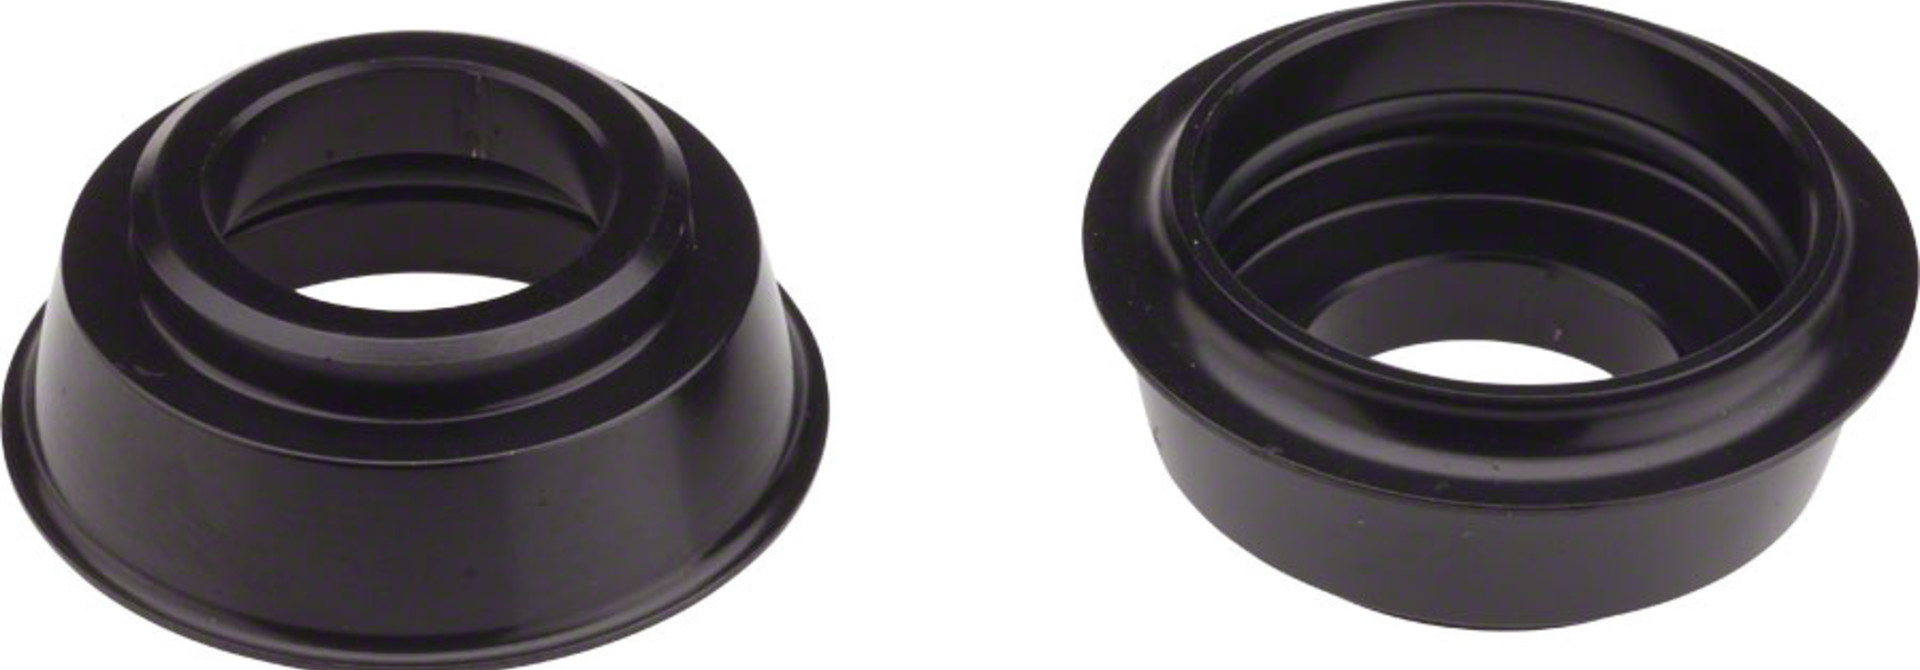 SRAM X0 Hub Conversion Caps Front 15mm Thru-Axle, Fits Rise XX, Roam 40, Roam 30 and 2015 Rise 60 wheels